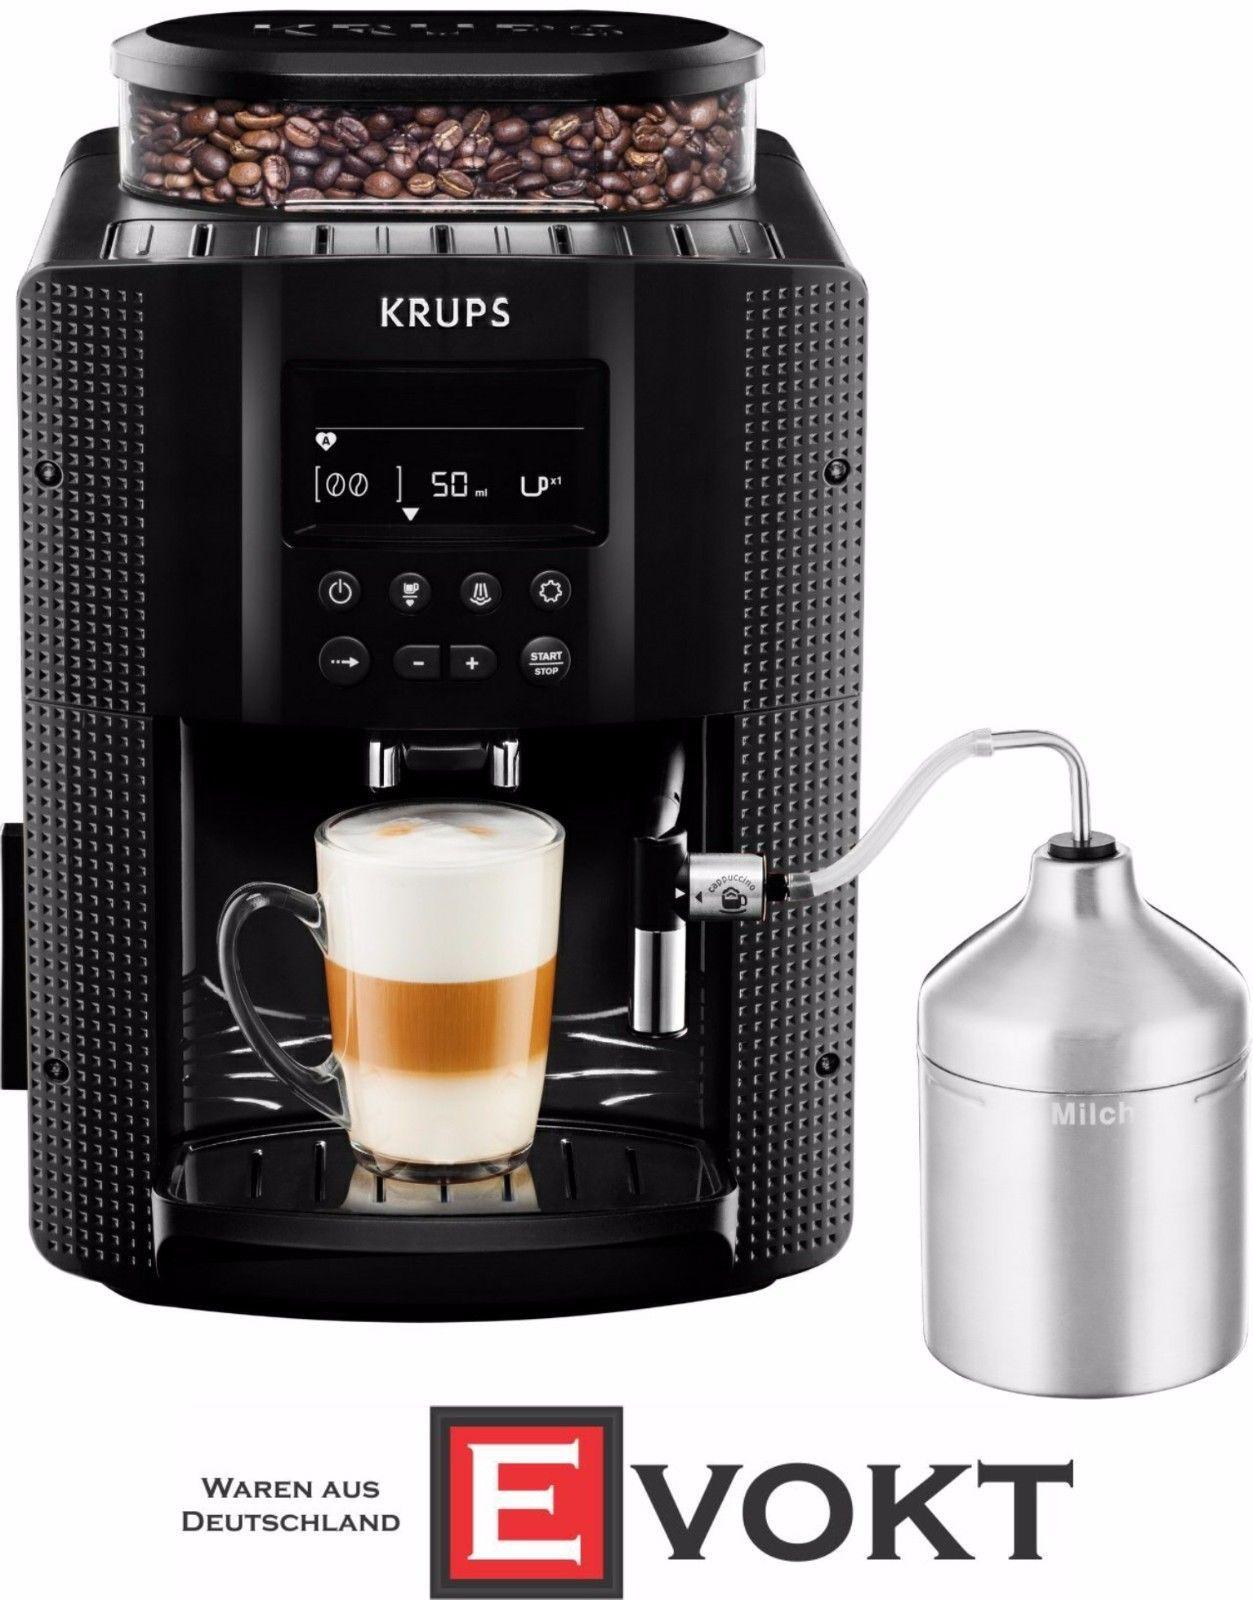 Krups Ea8160 Fully Automatic Espresso Machine Black 1450w Genuine New 10942218647 Ebay Espresso Coffee Coffee Maker Coffee Machine